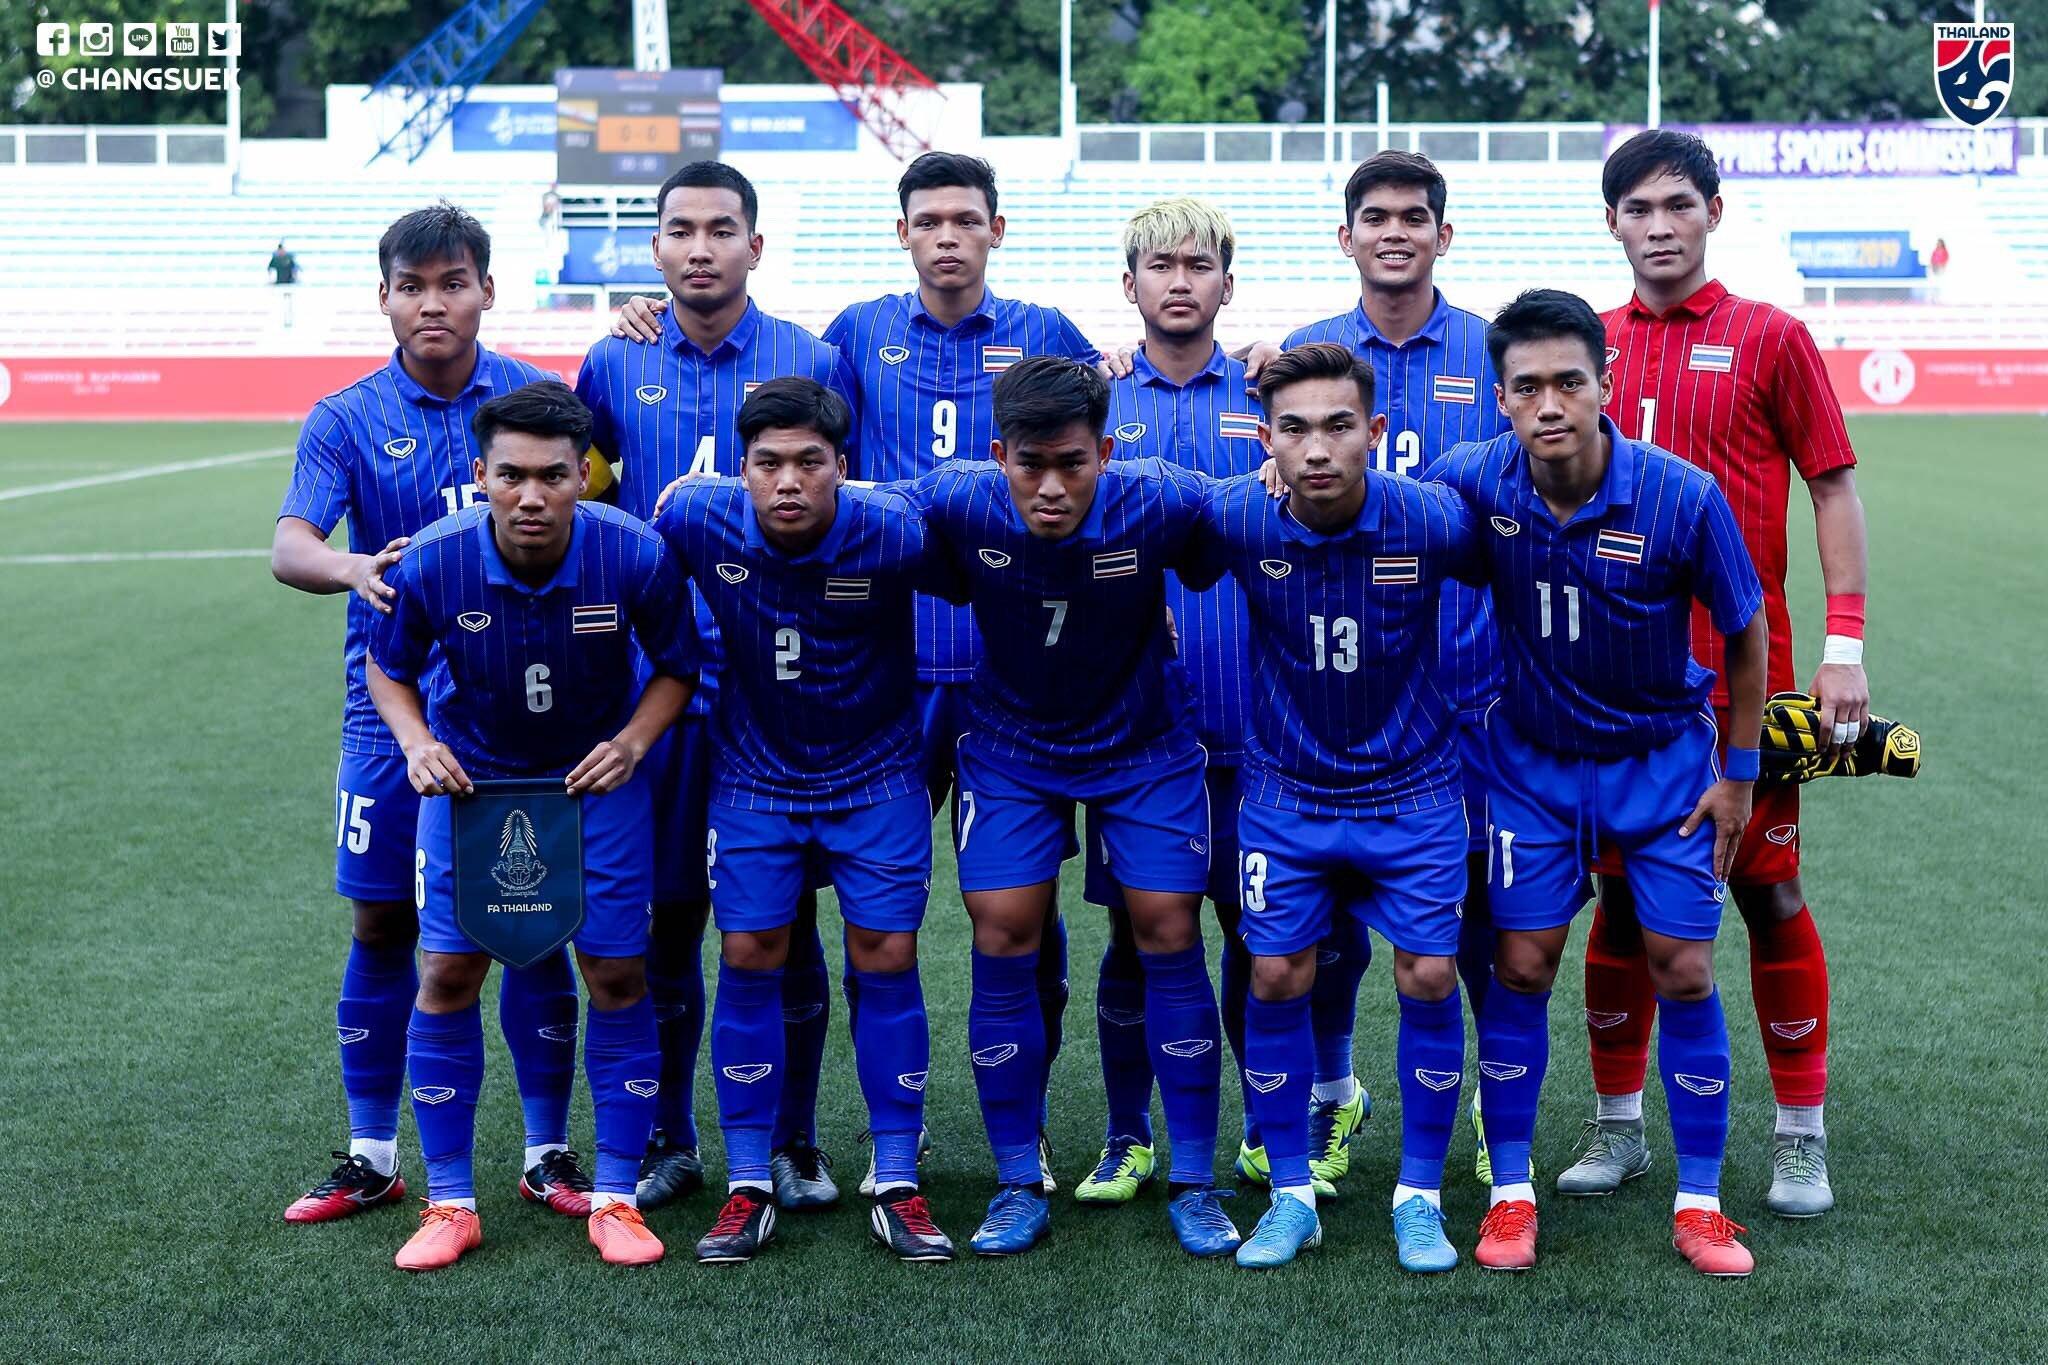 https: img-k.okeinfo.net content 2019 11 28 51 2135613 thailand-hajar-brunei-7-0-vietnam-sikat-laos-di-sea-games-2019-KrWx4qfU4X.jpg